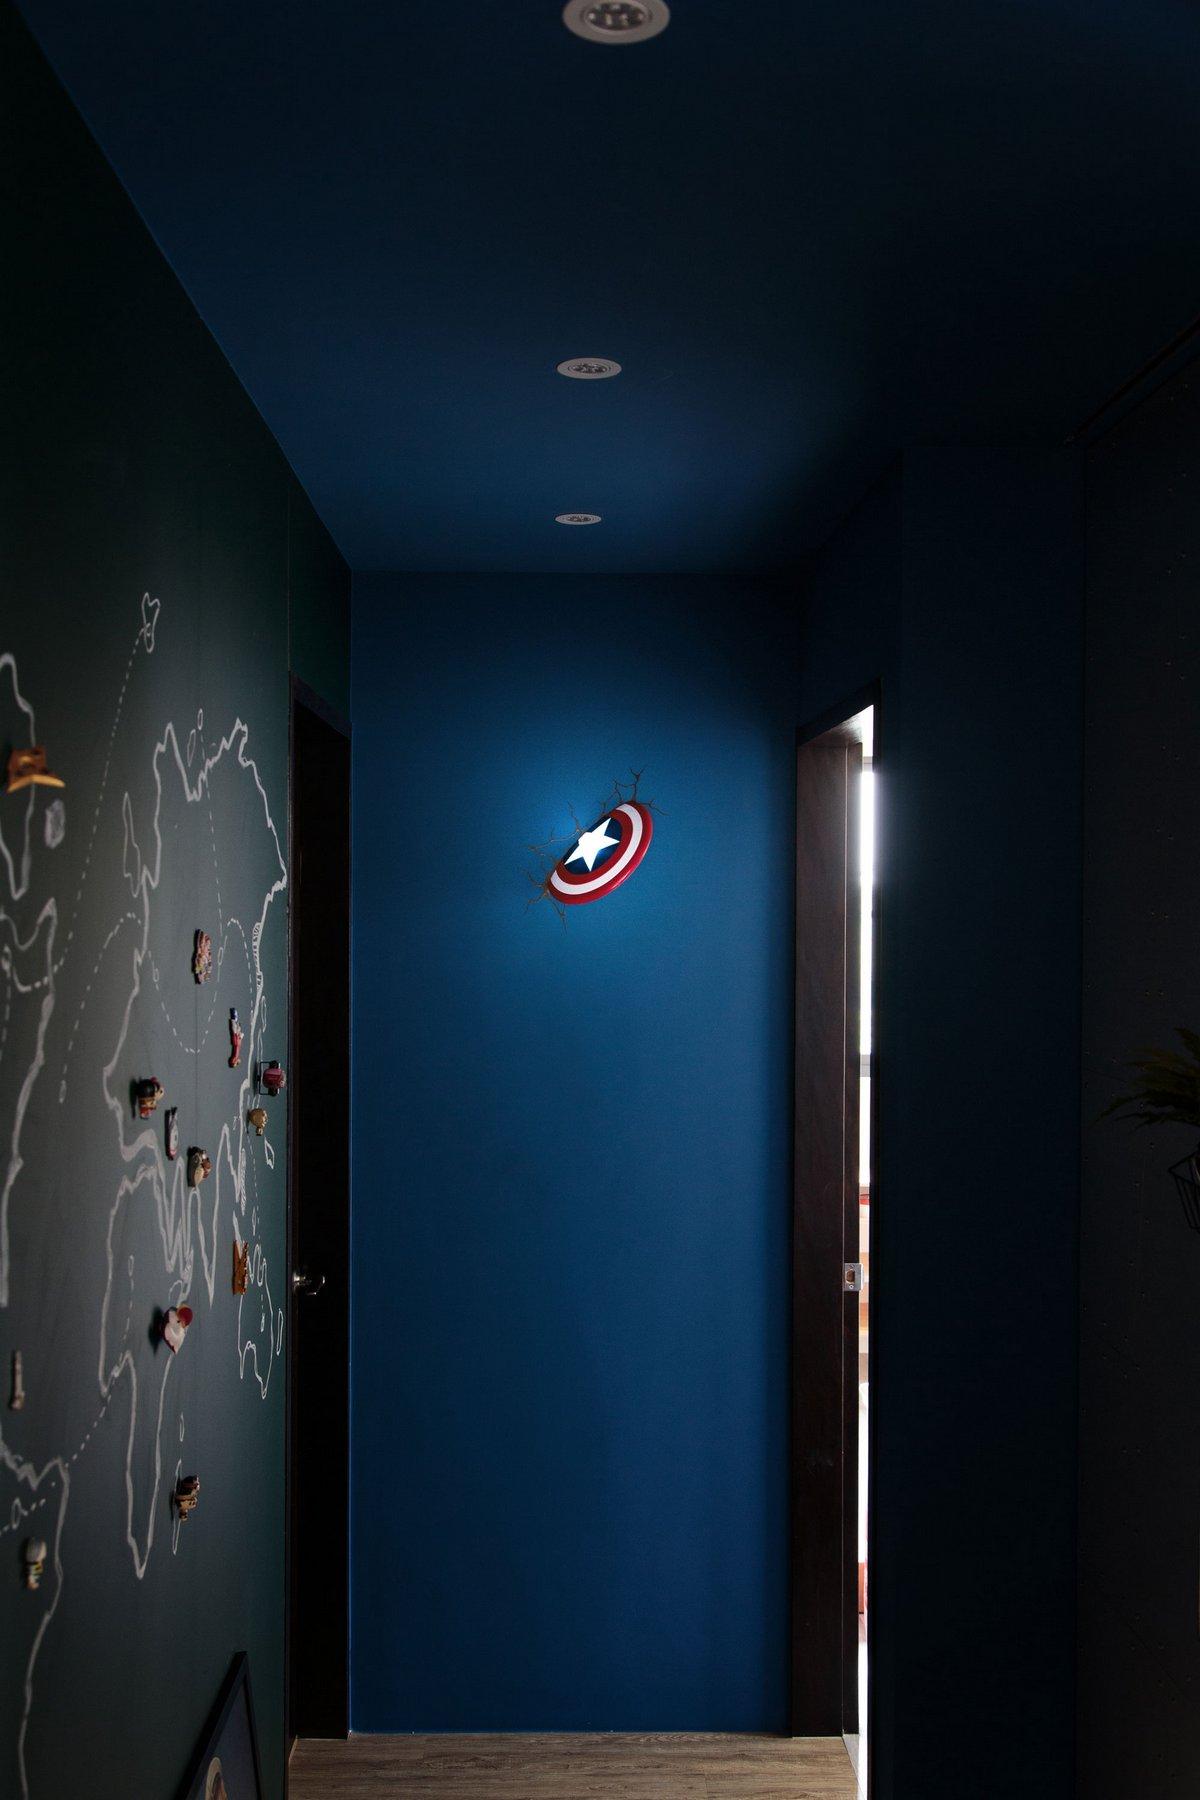 House Design Studio, House About To Launch, квартира для супергероя, дизайн квартиры для мальчика, дизайн интерьера для фаната героев, квартиры Тайнань